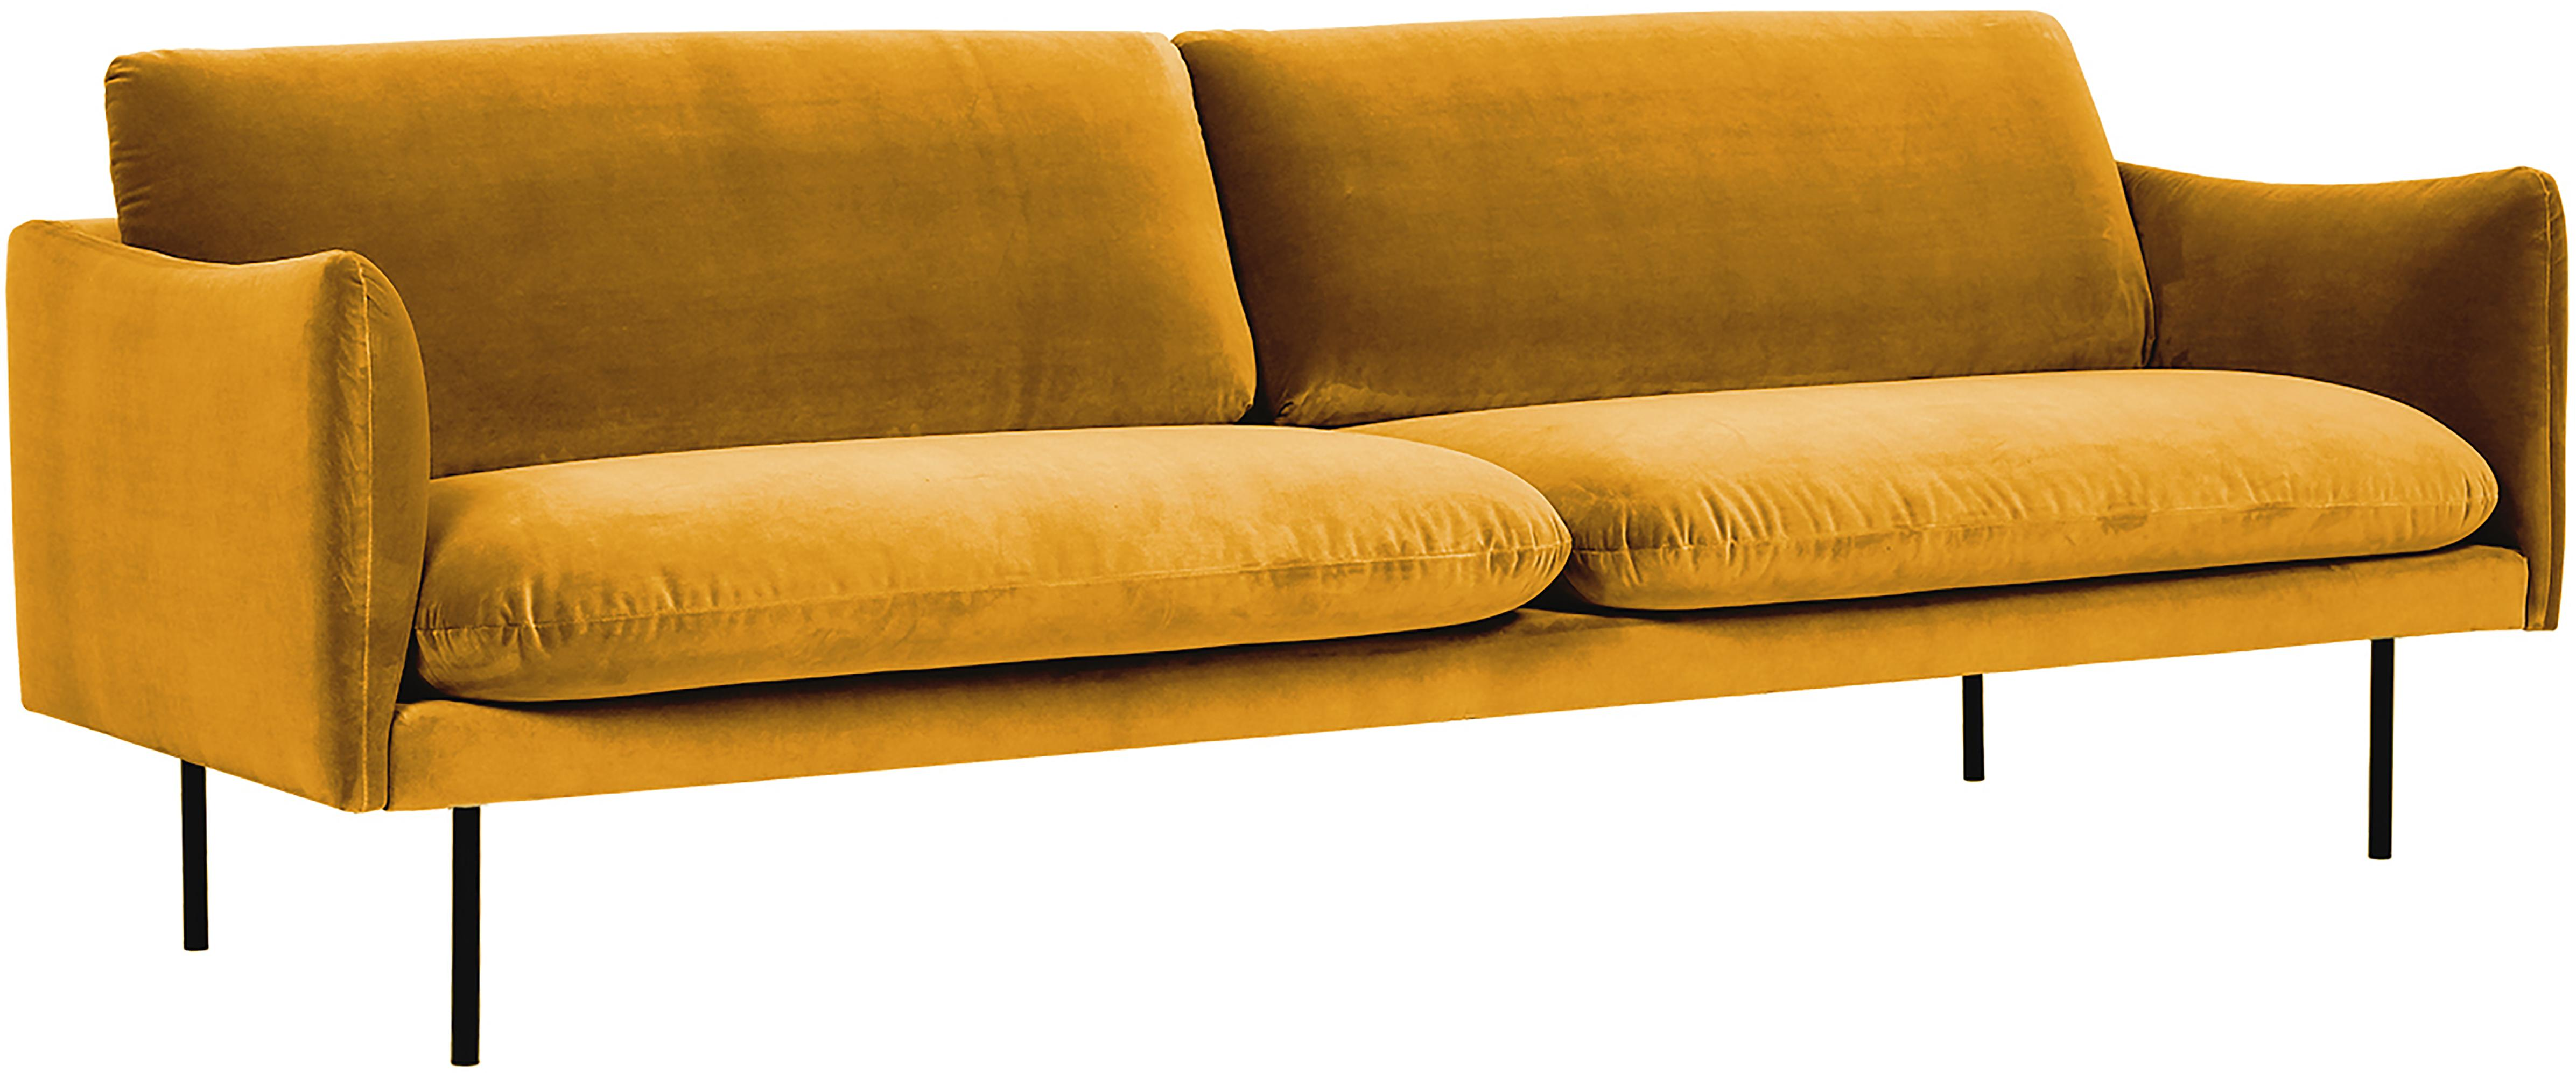 Samt-Sofa Moby (3-Sitzer), Bezug: Samt (Hochwertiger Polyes, Gestell: Massives Kiefernholz, Füße: Metall, pulverbeschichtet, Samt Senfgelb, B 220 x T 95 cm